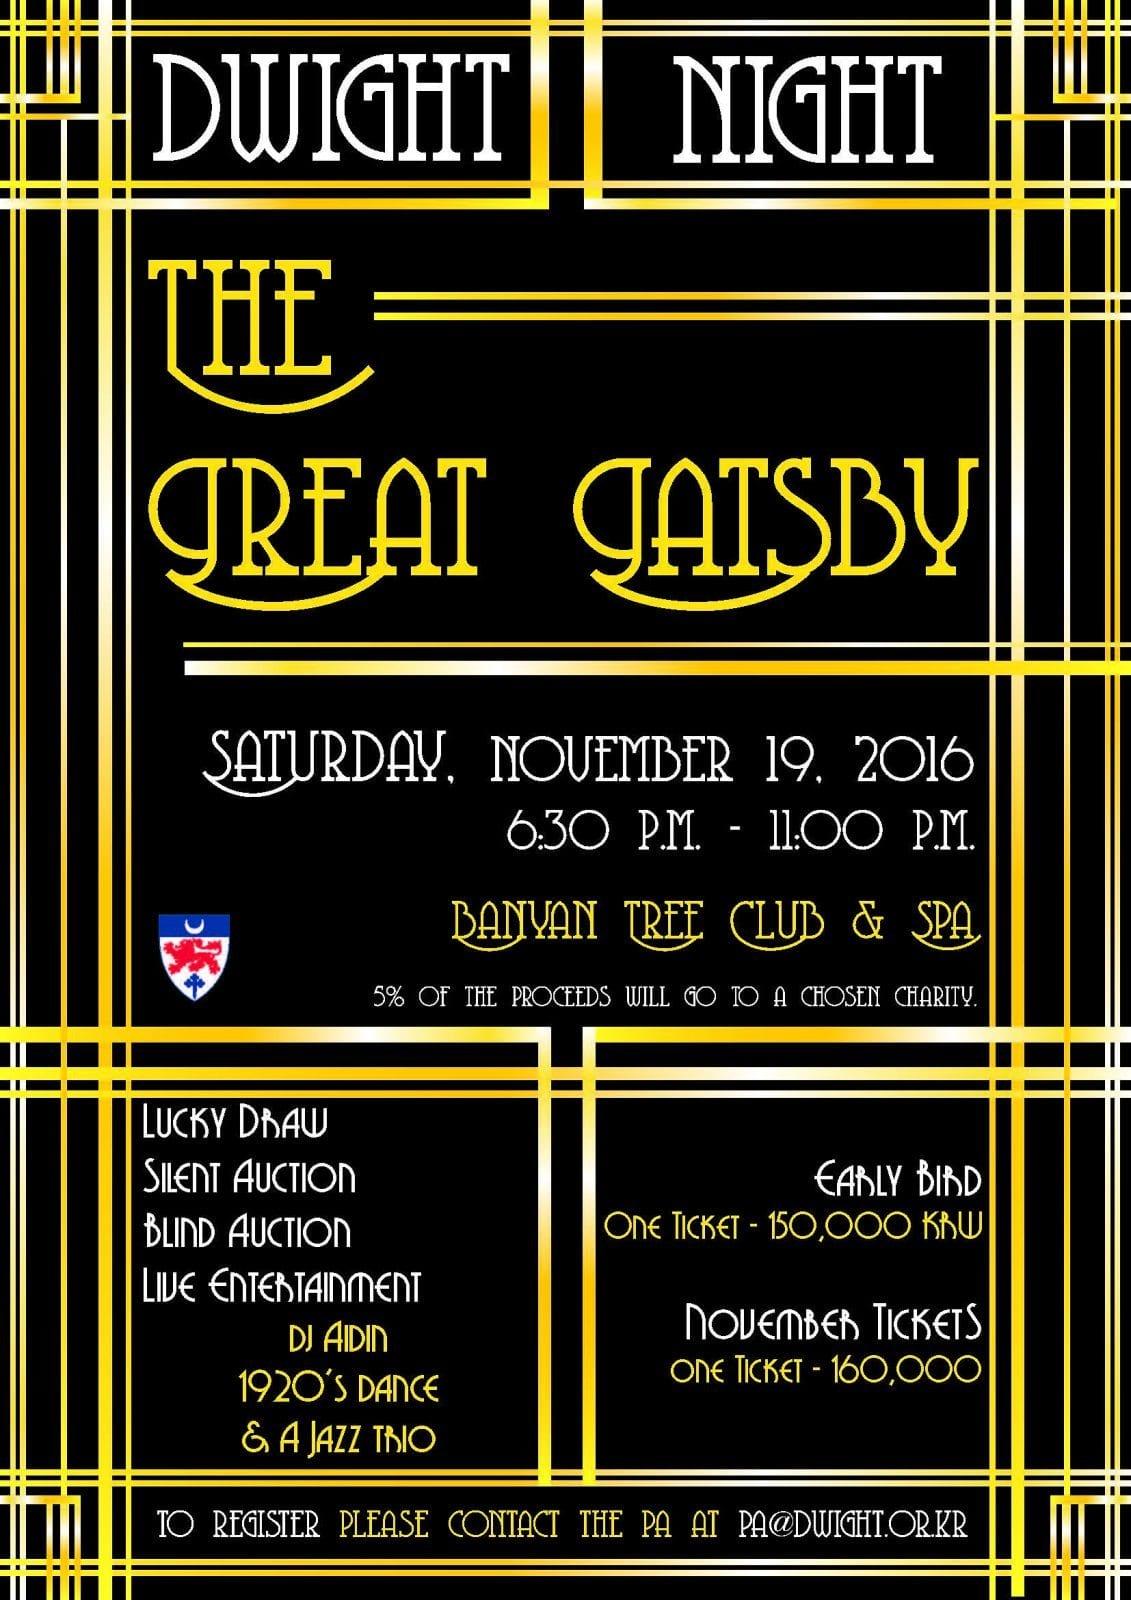 dwight school seoul great-gatsby-poster-2016